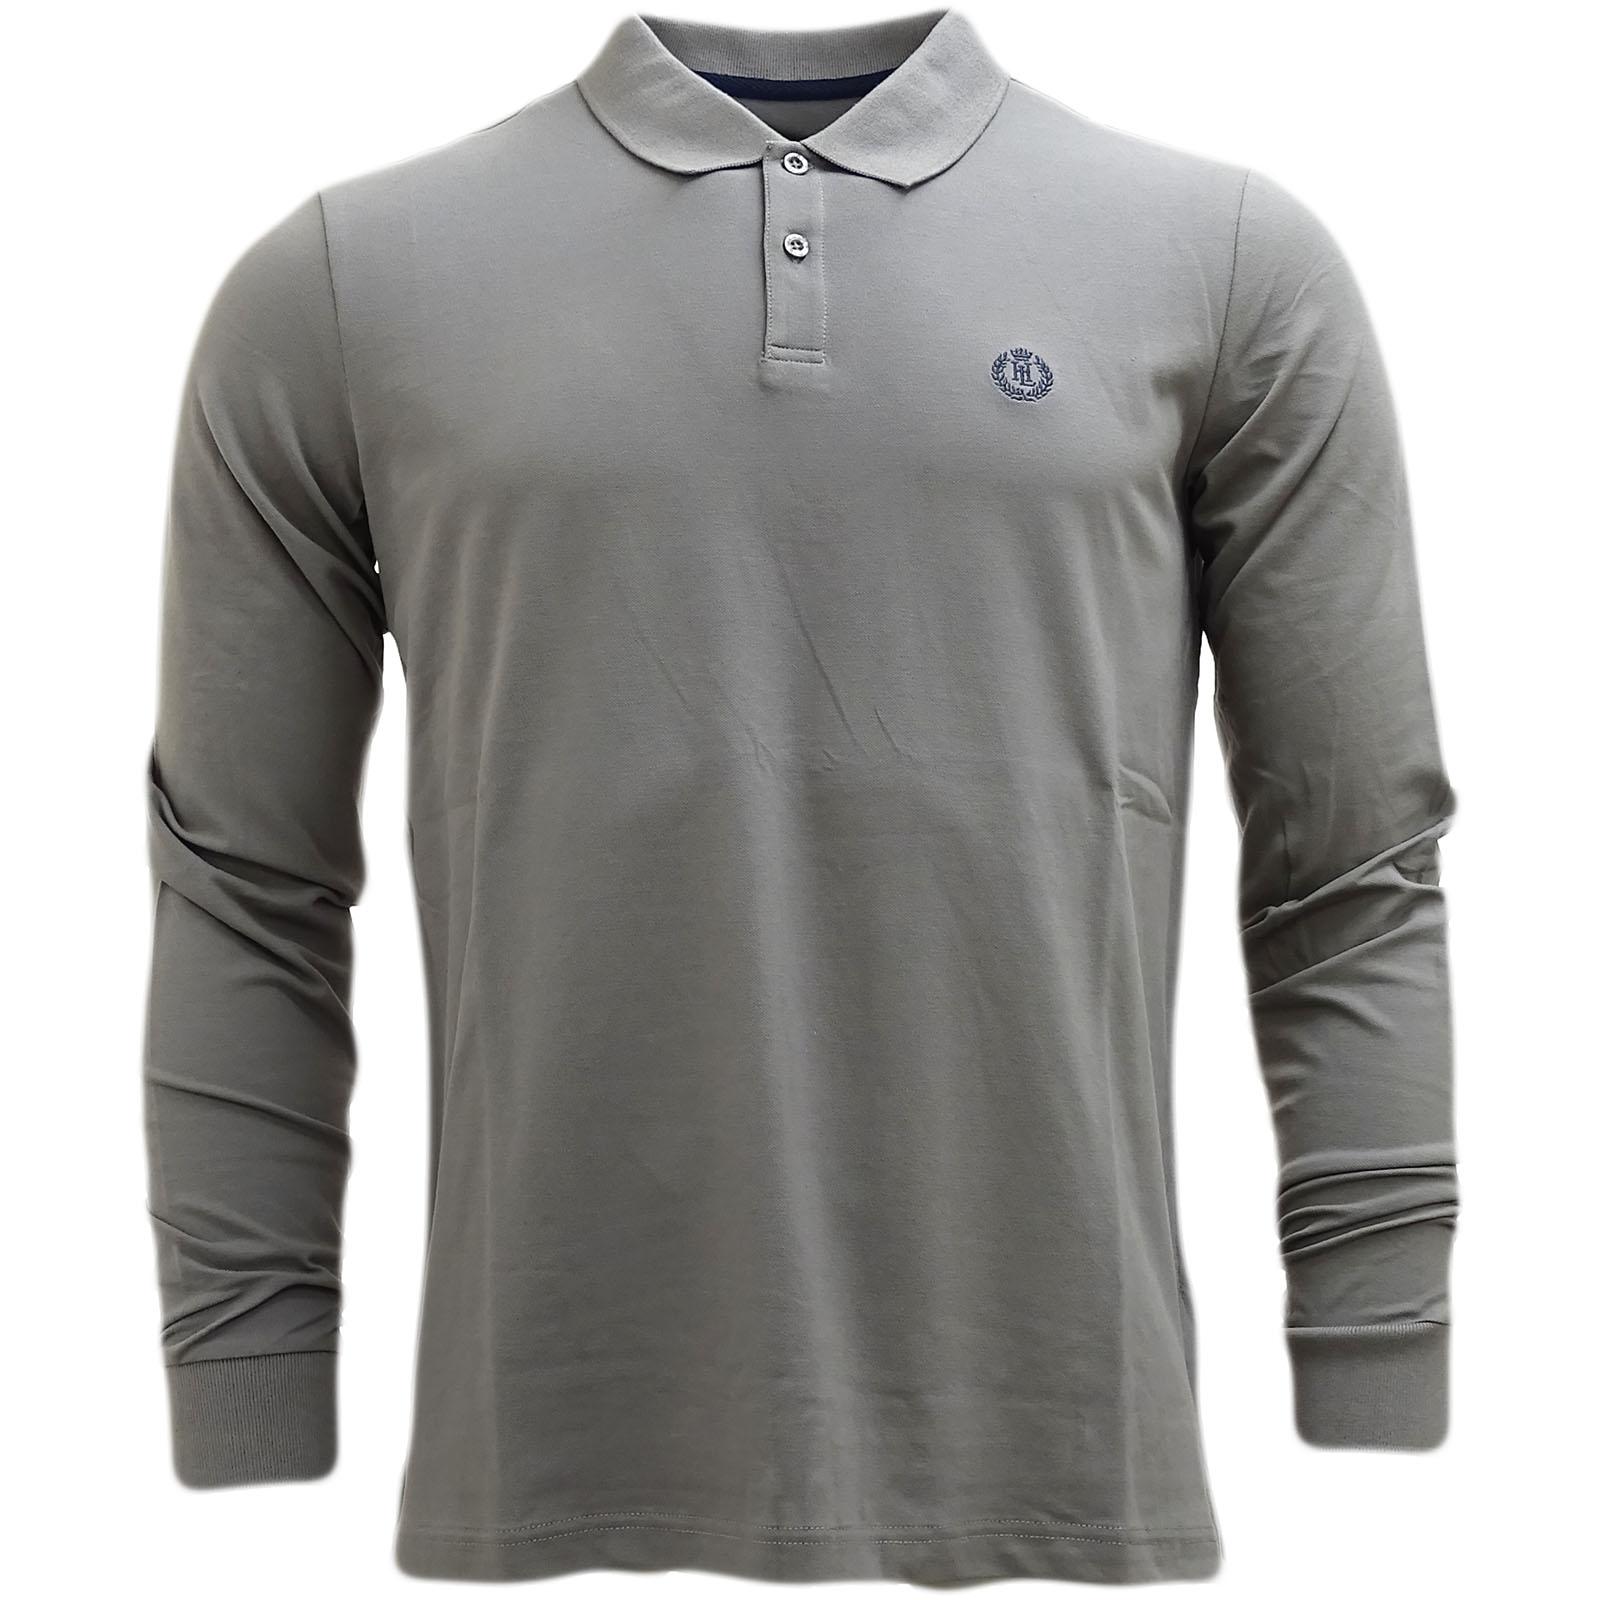 Henri-Lloyd-musburry-Long-Sleeve-Polo-Shirt